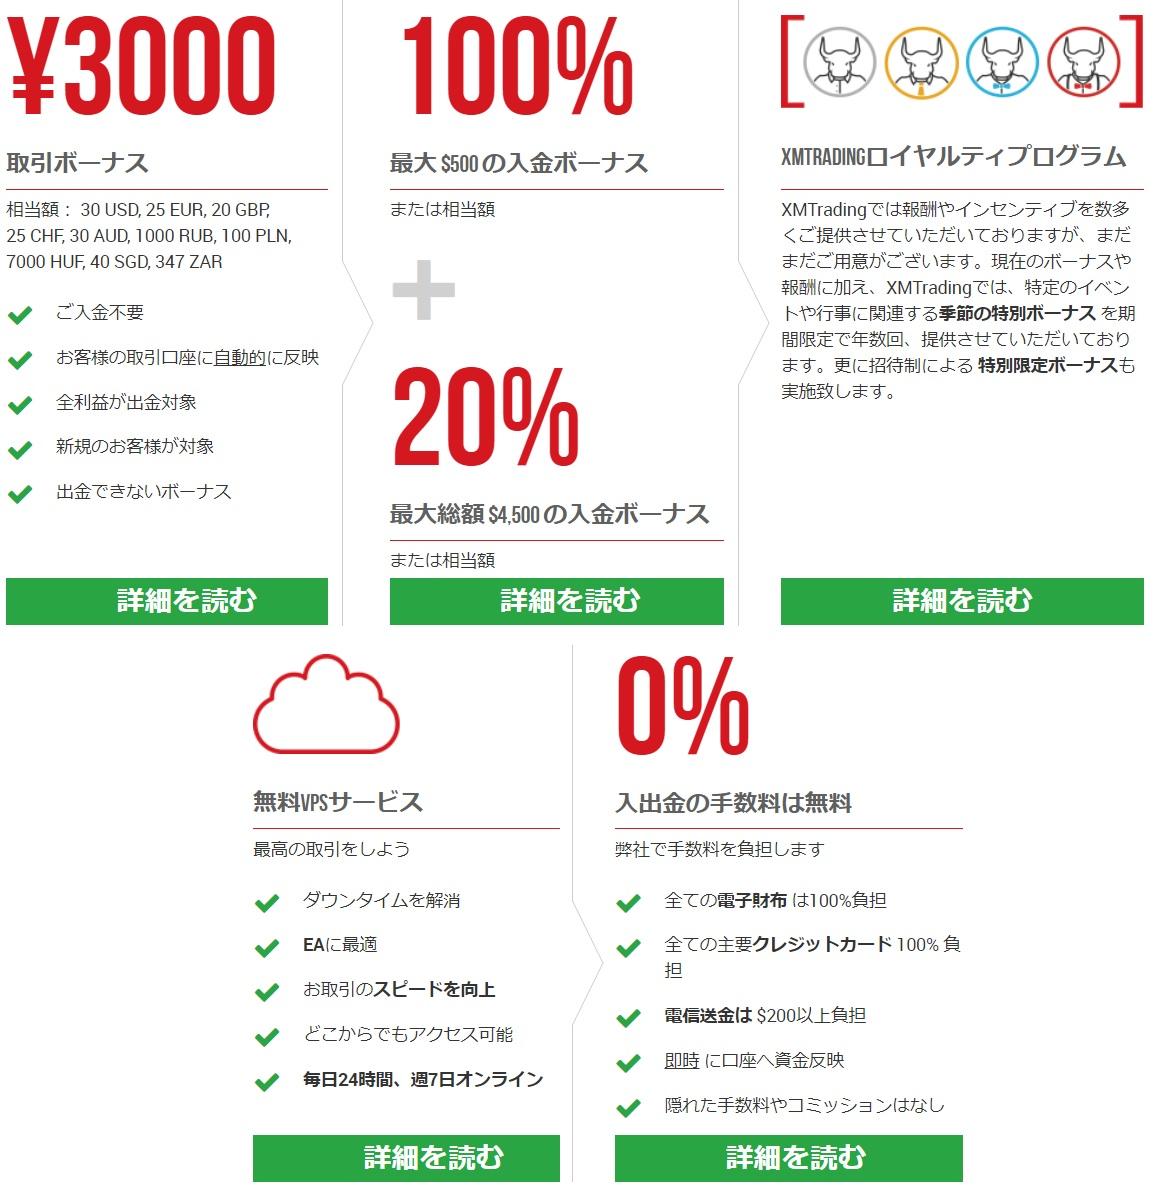 xm証券の100%ボーナスキャンペーン最新.jpg